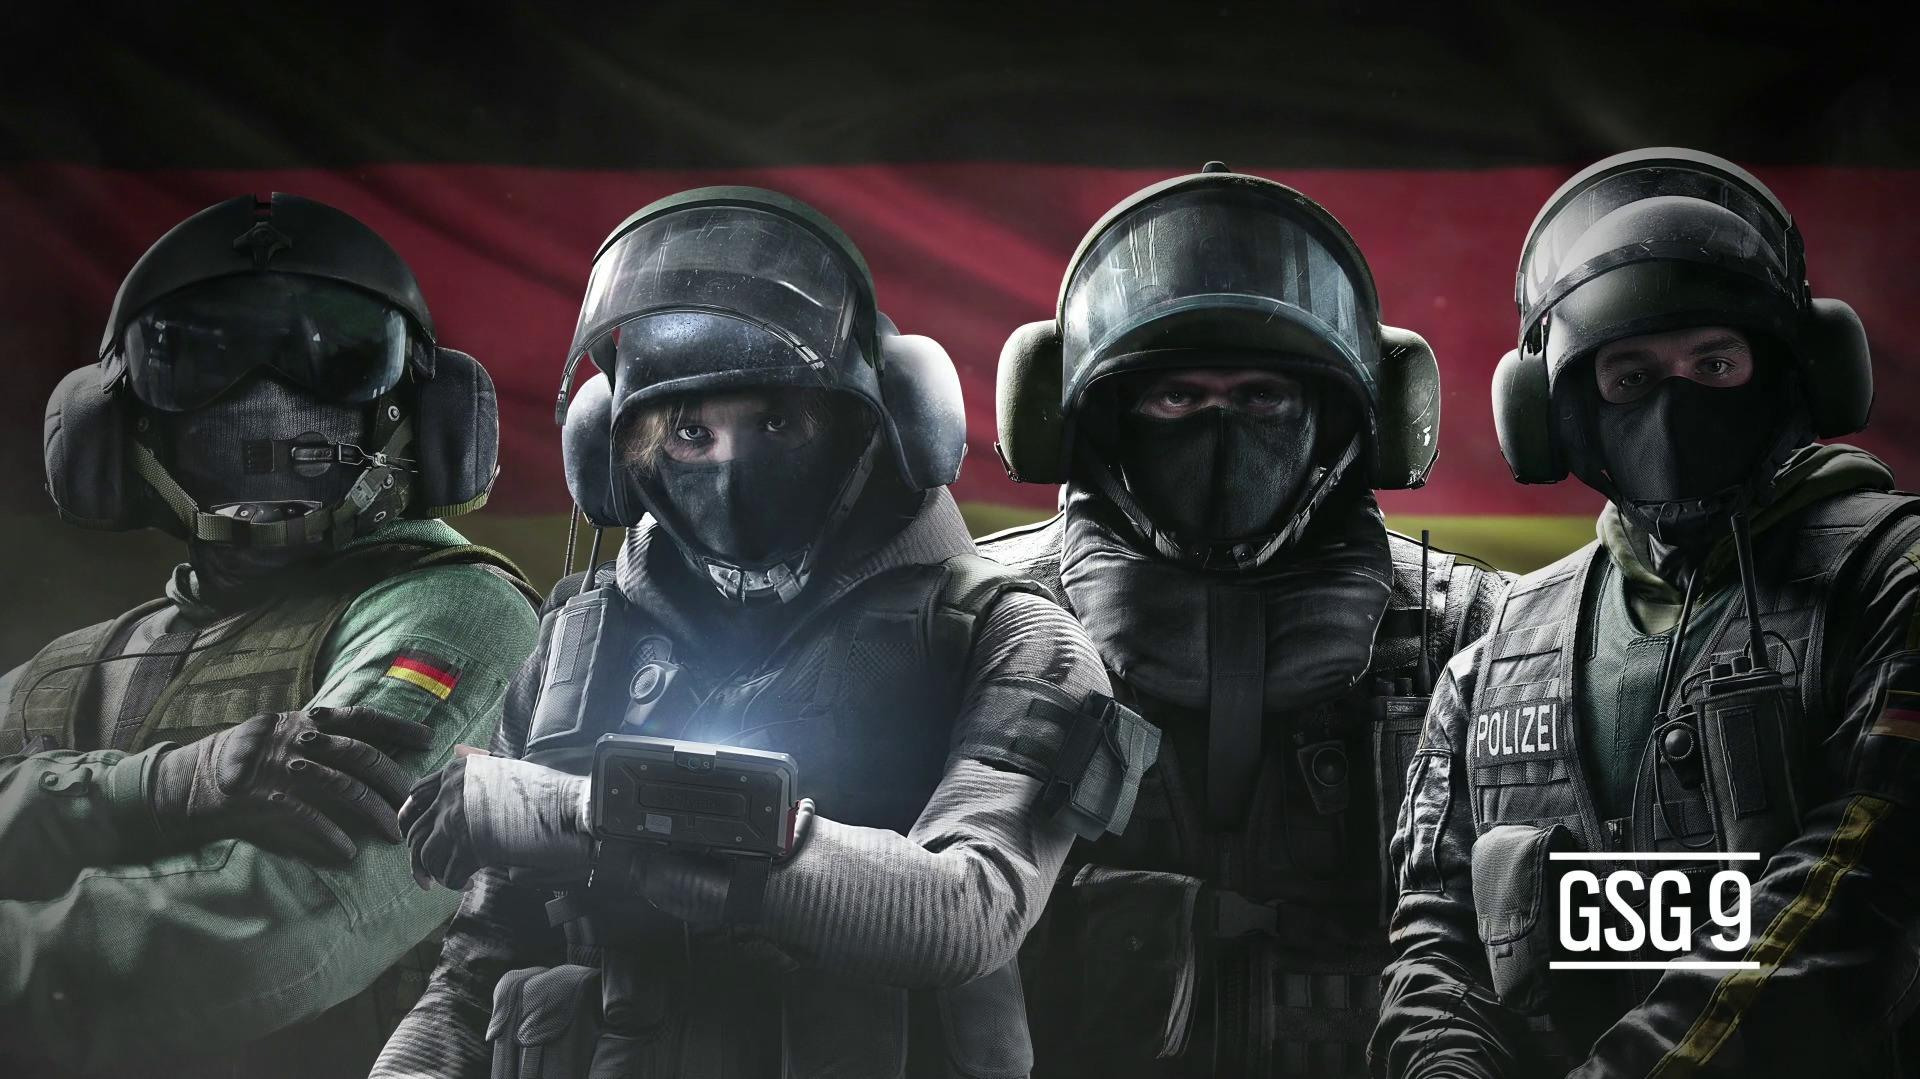 Rainbow Six Siege Gign Operators: Rainbow Six Siege Inside Rainbow 4 Trailer